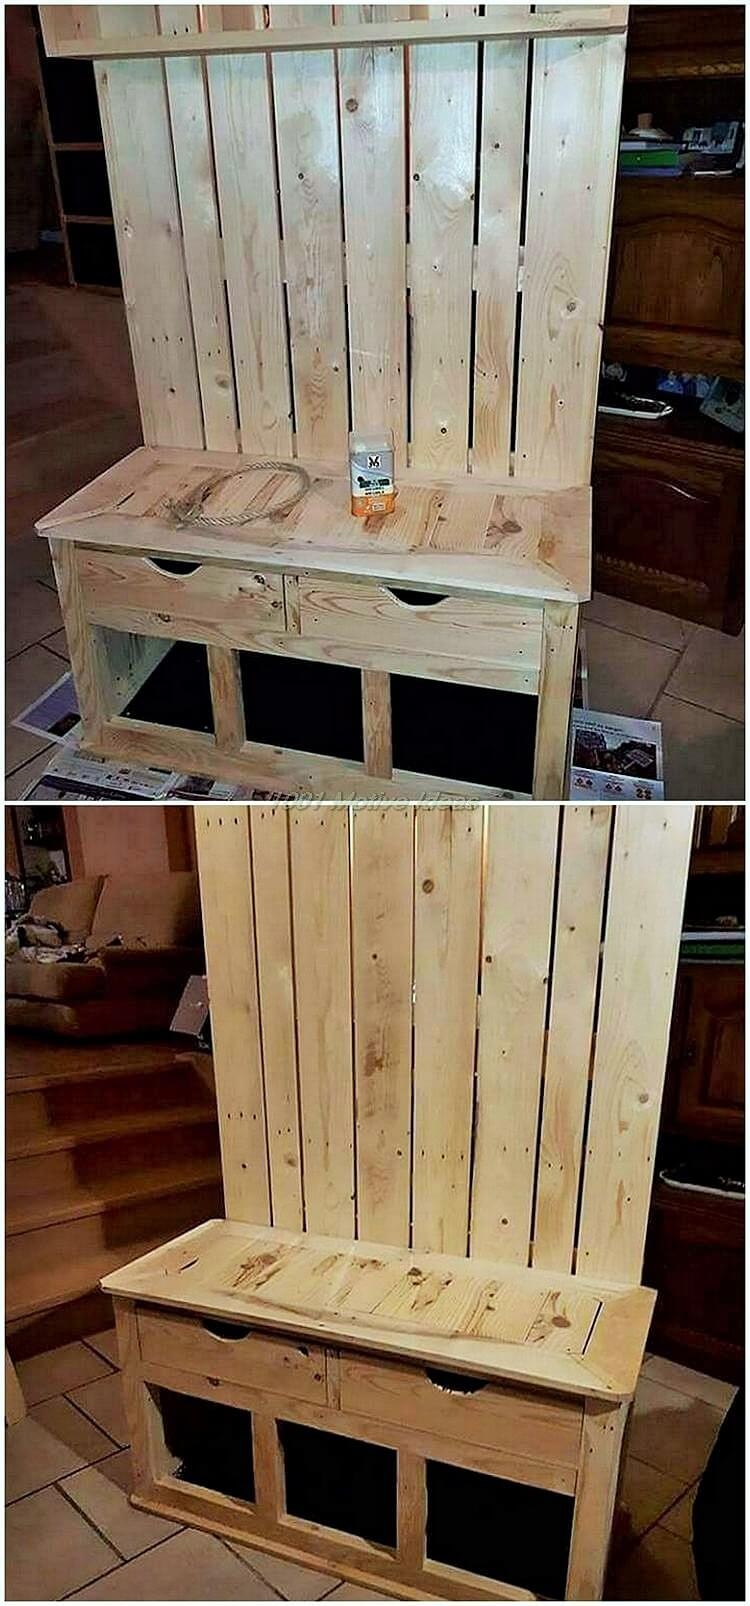 wooden-Pallet-Kitchen-furniture-Project-Ideas-005